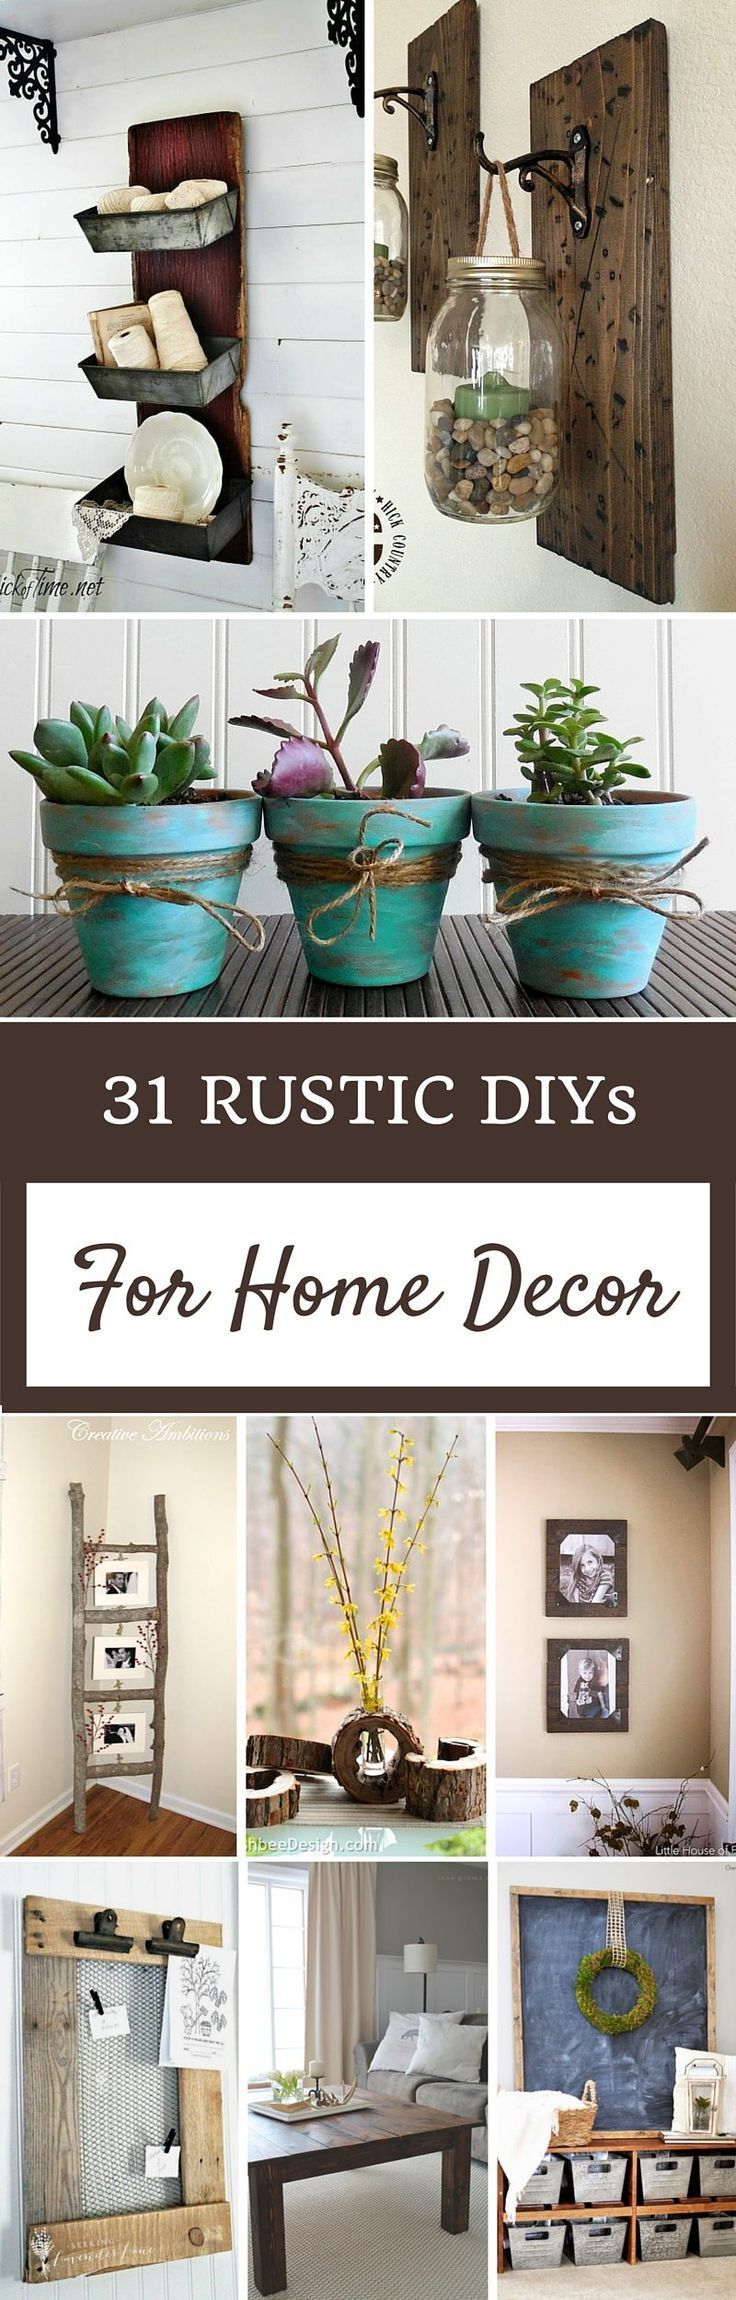 Diy Home Decor 685 Best Home Decor Diy Images On Pinterest